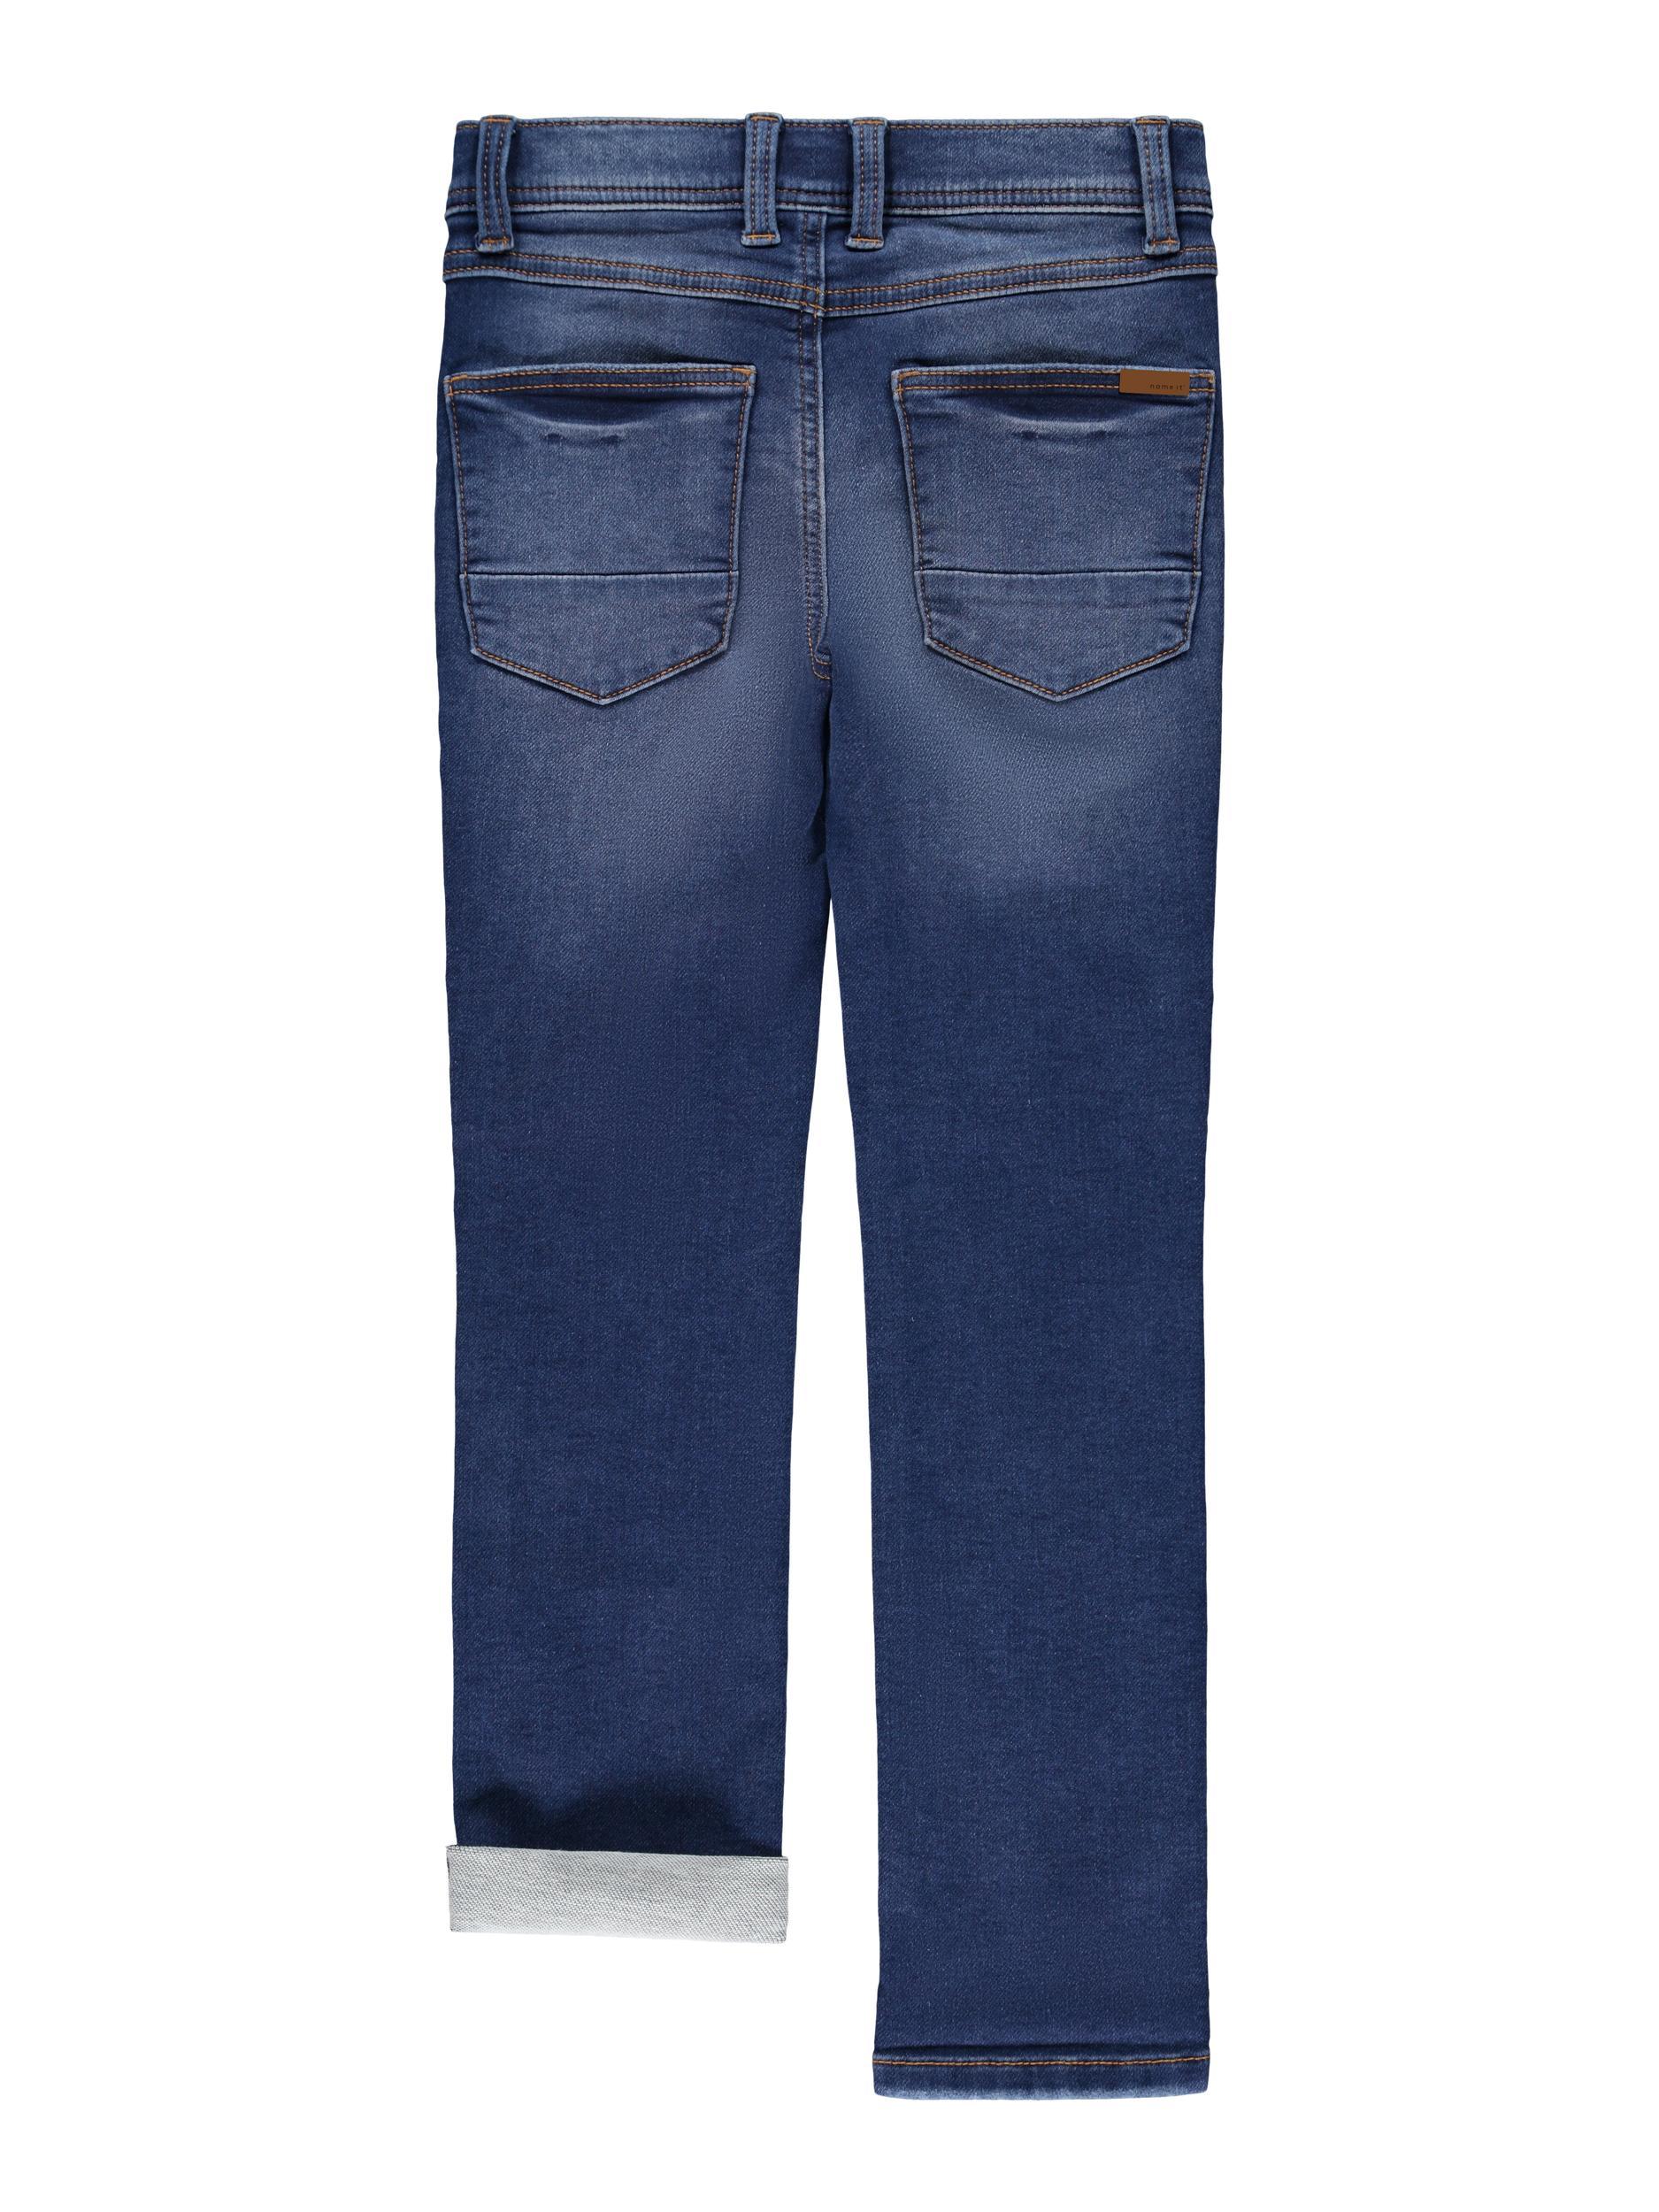 Name It Theo Times jeans, dark blue denim, 116